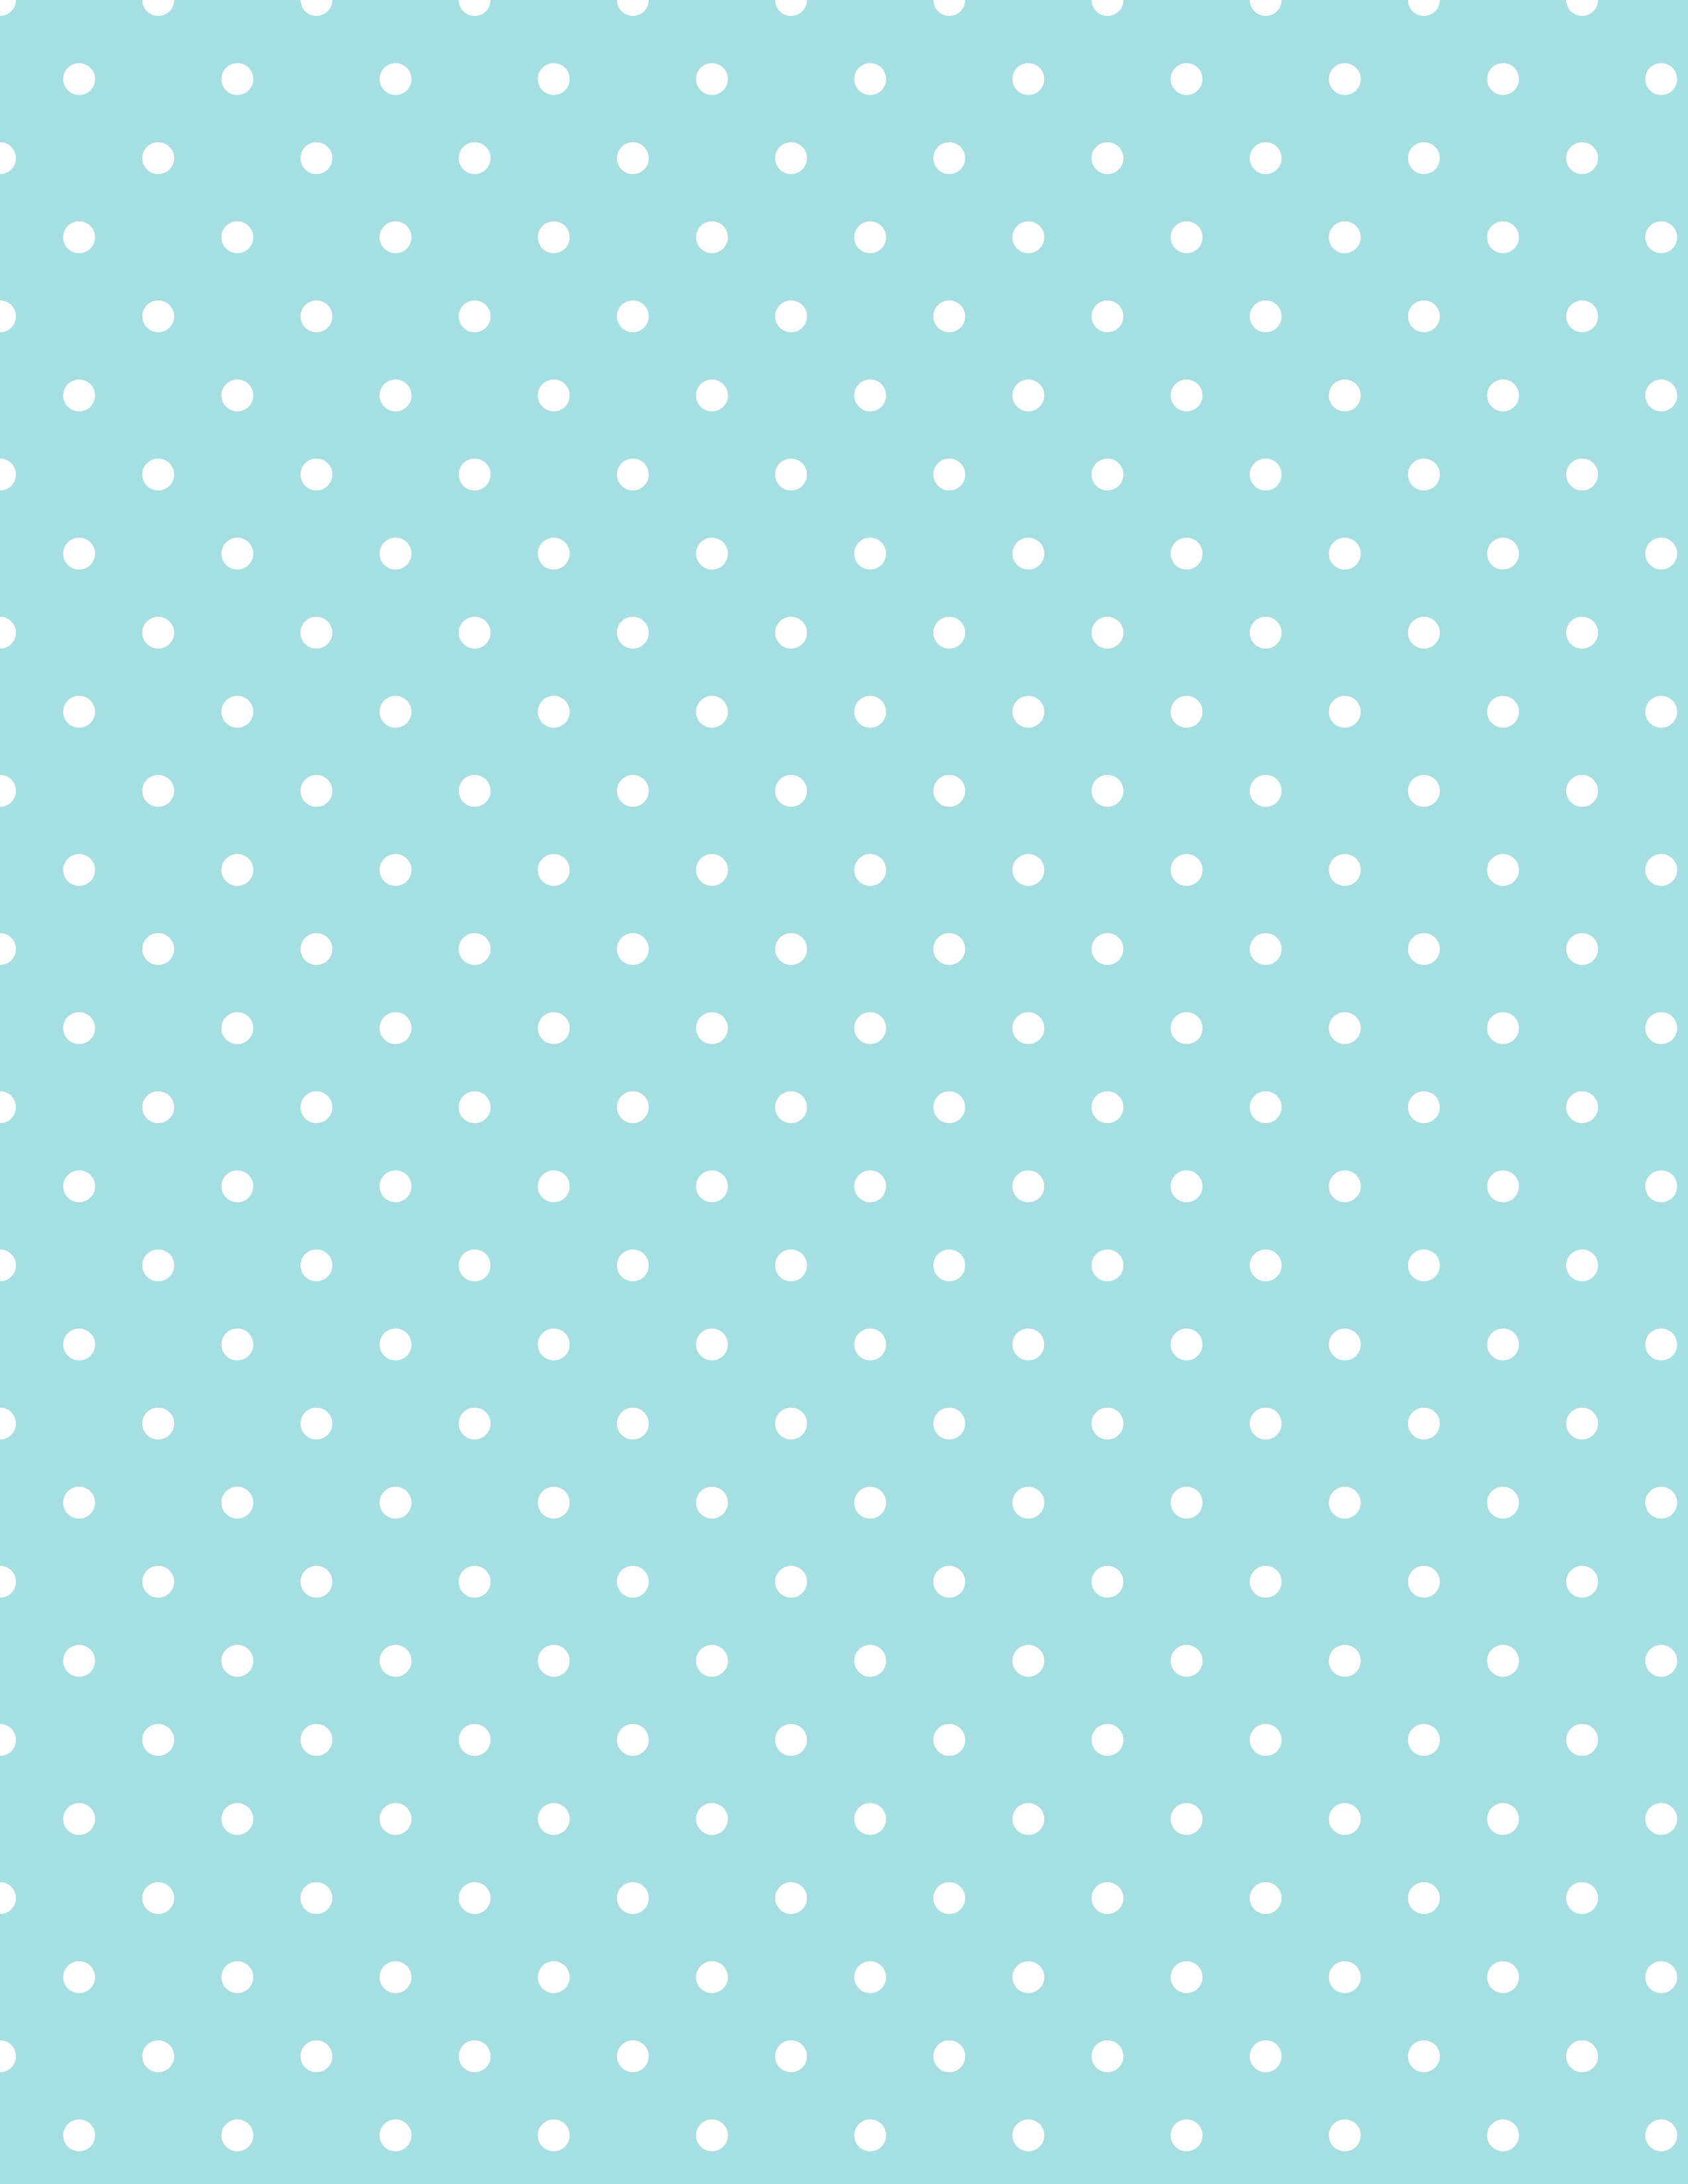 Silver Animal Print Wallpaper Polka Dot All Things Positively Positive